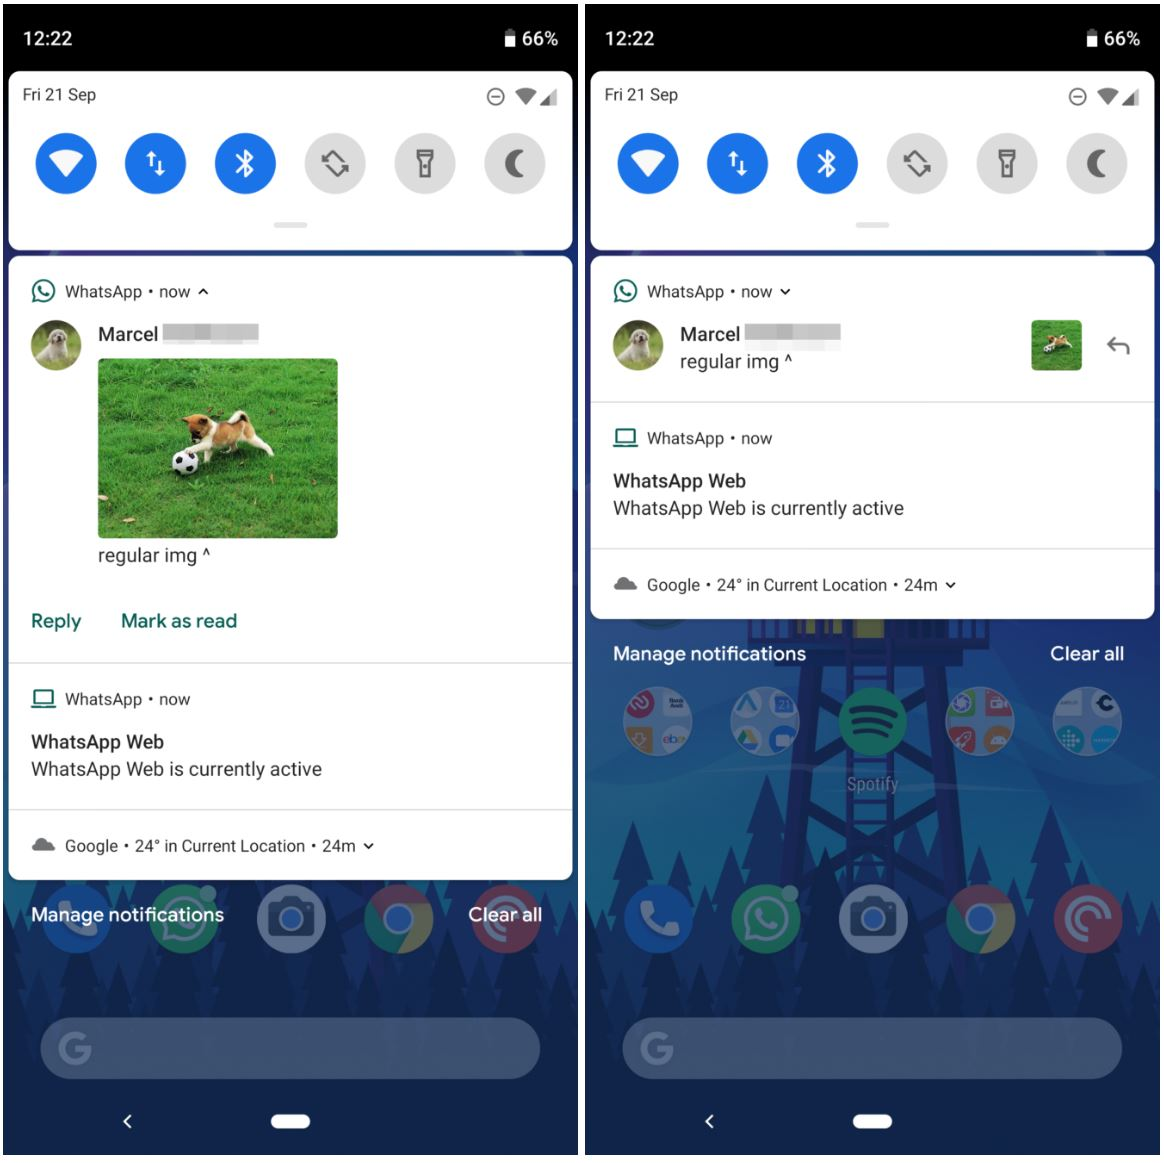 whatsapp functii android iphone 1